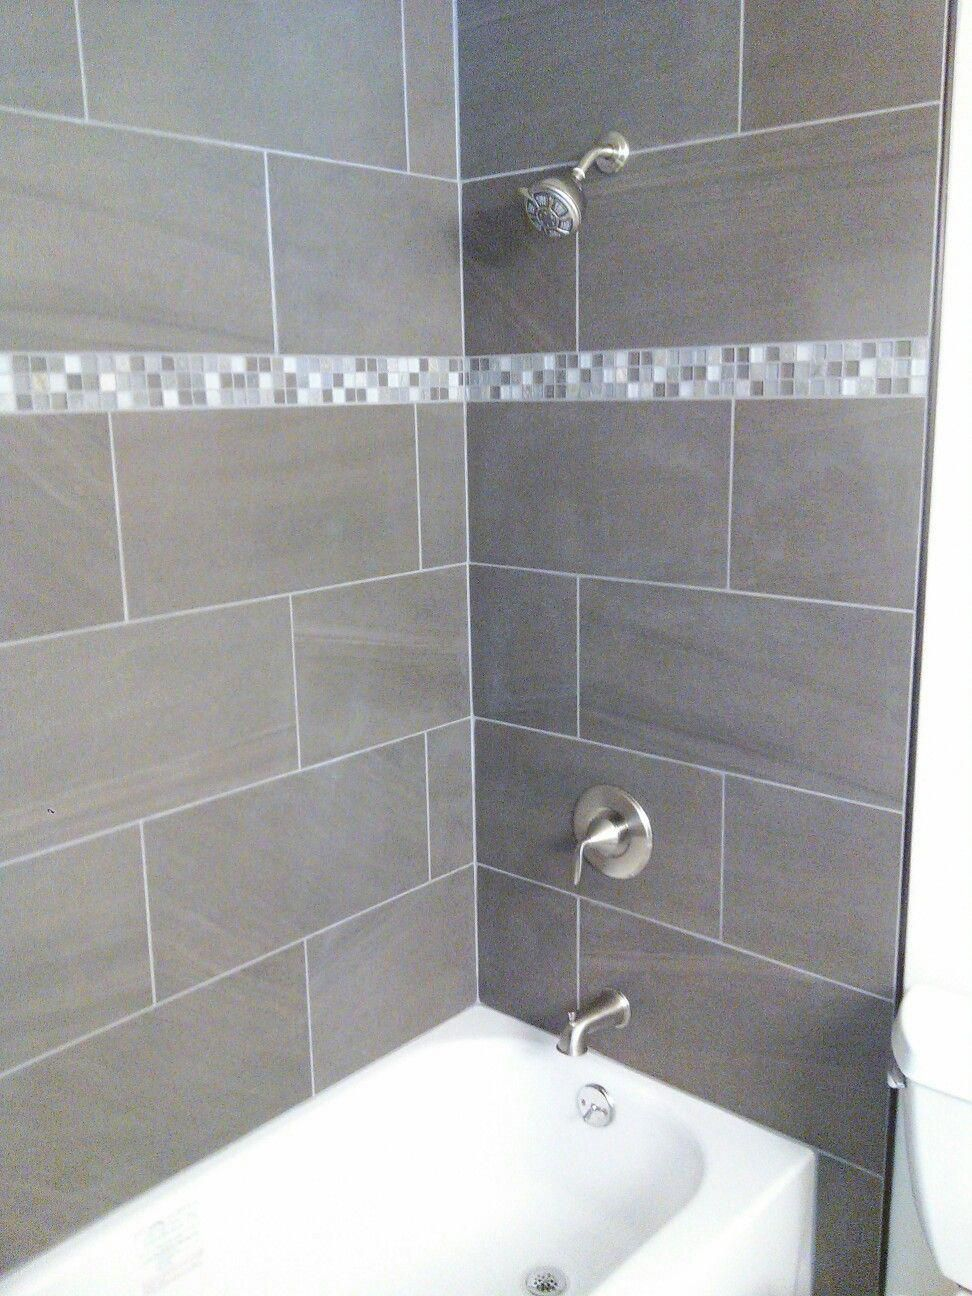 Bathroom Ideas Youtube Bathroomtubewall Bathroom Shower Tile Grey Bathroom Tiles Shower Tile